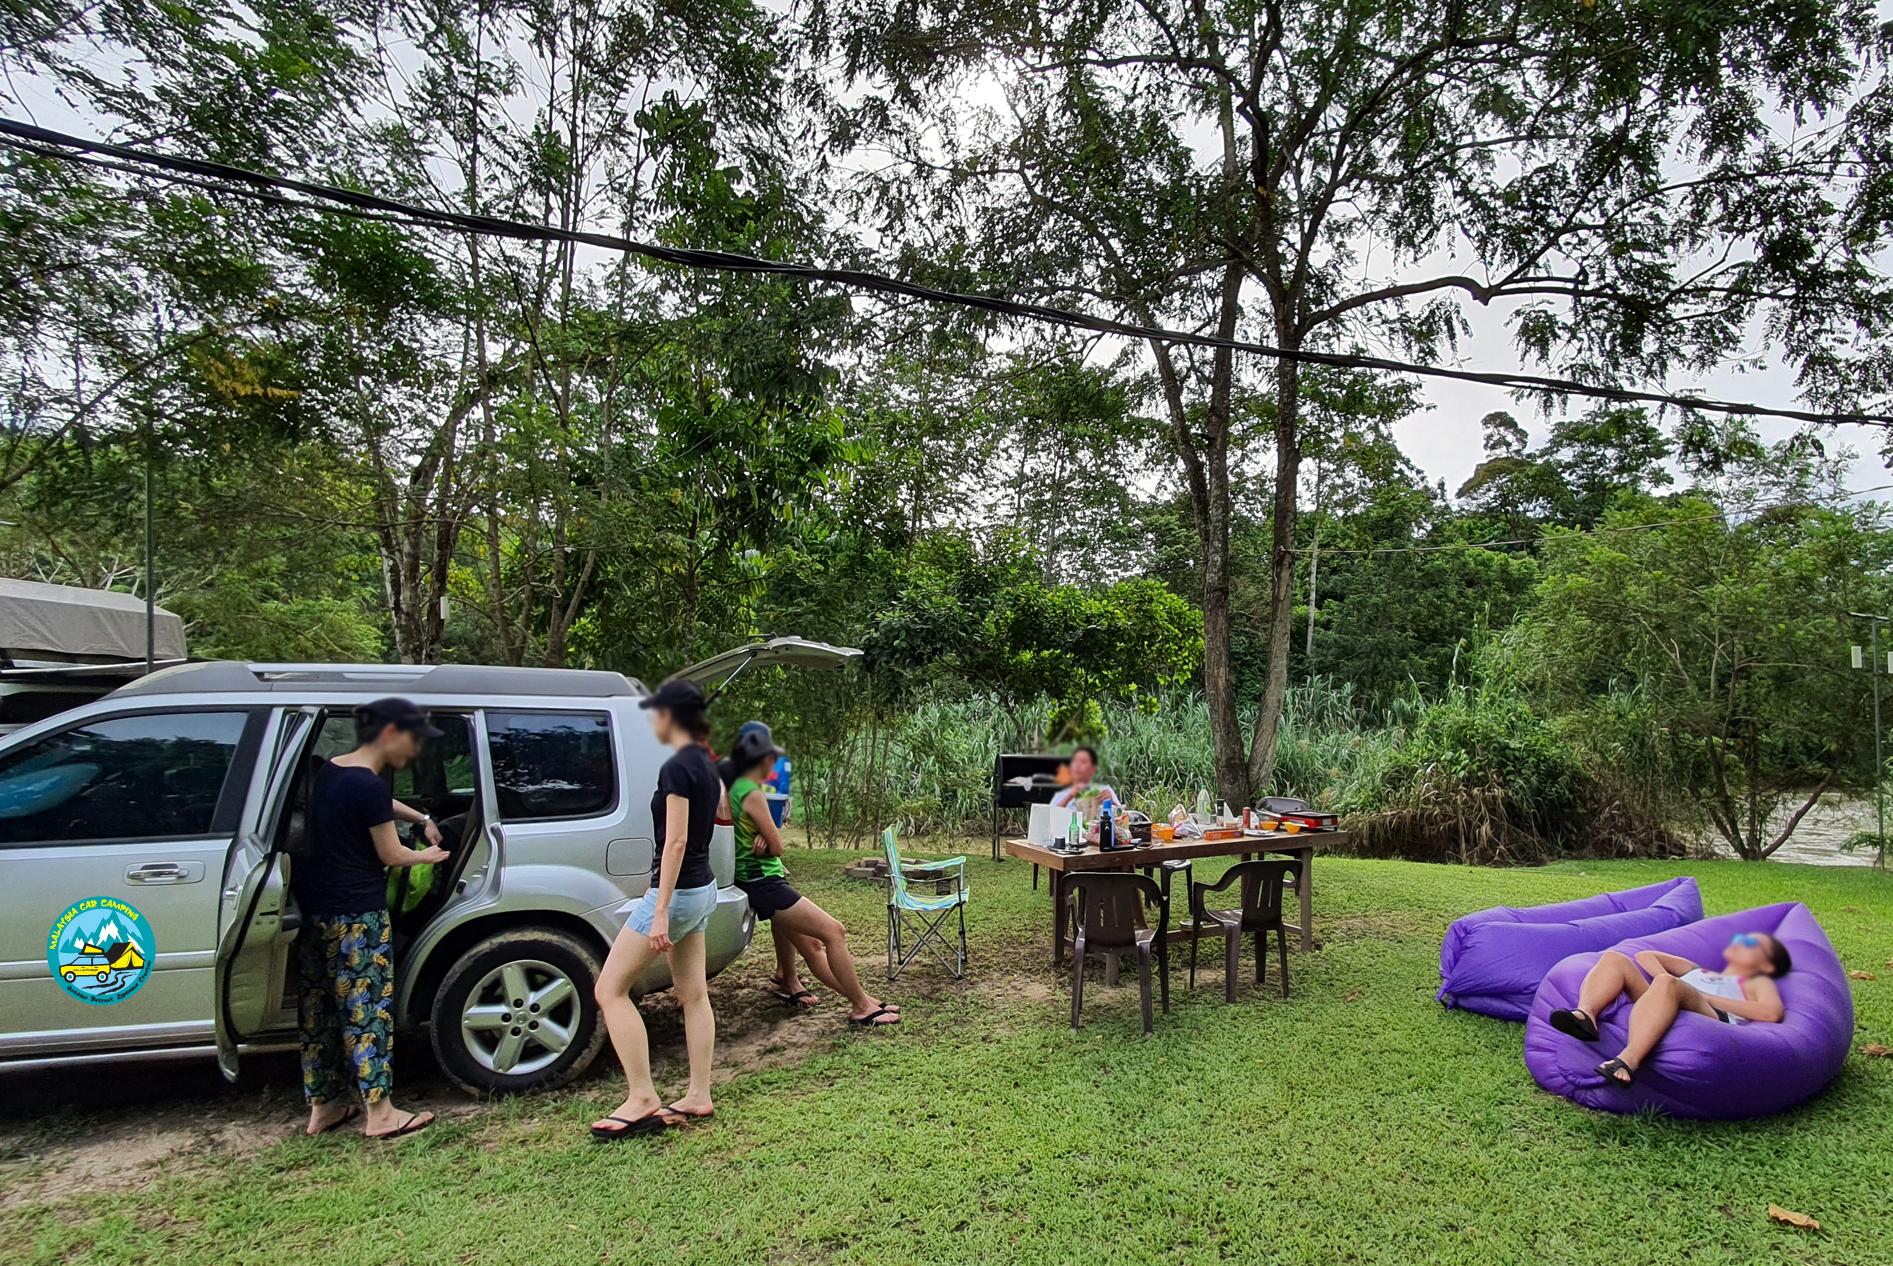 glamping_at_kangkoi_negeri_sembilan_camping_site_malaysia_car_camping_private_event_organizer-9